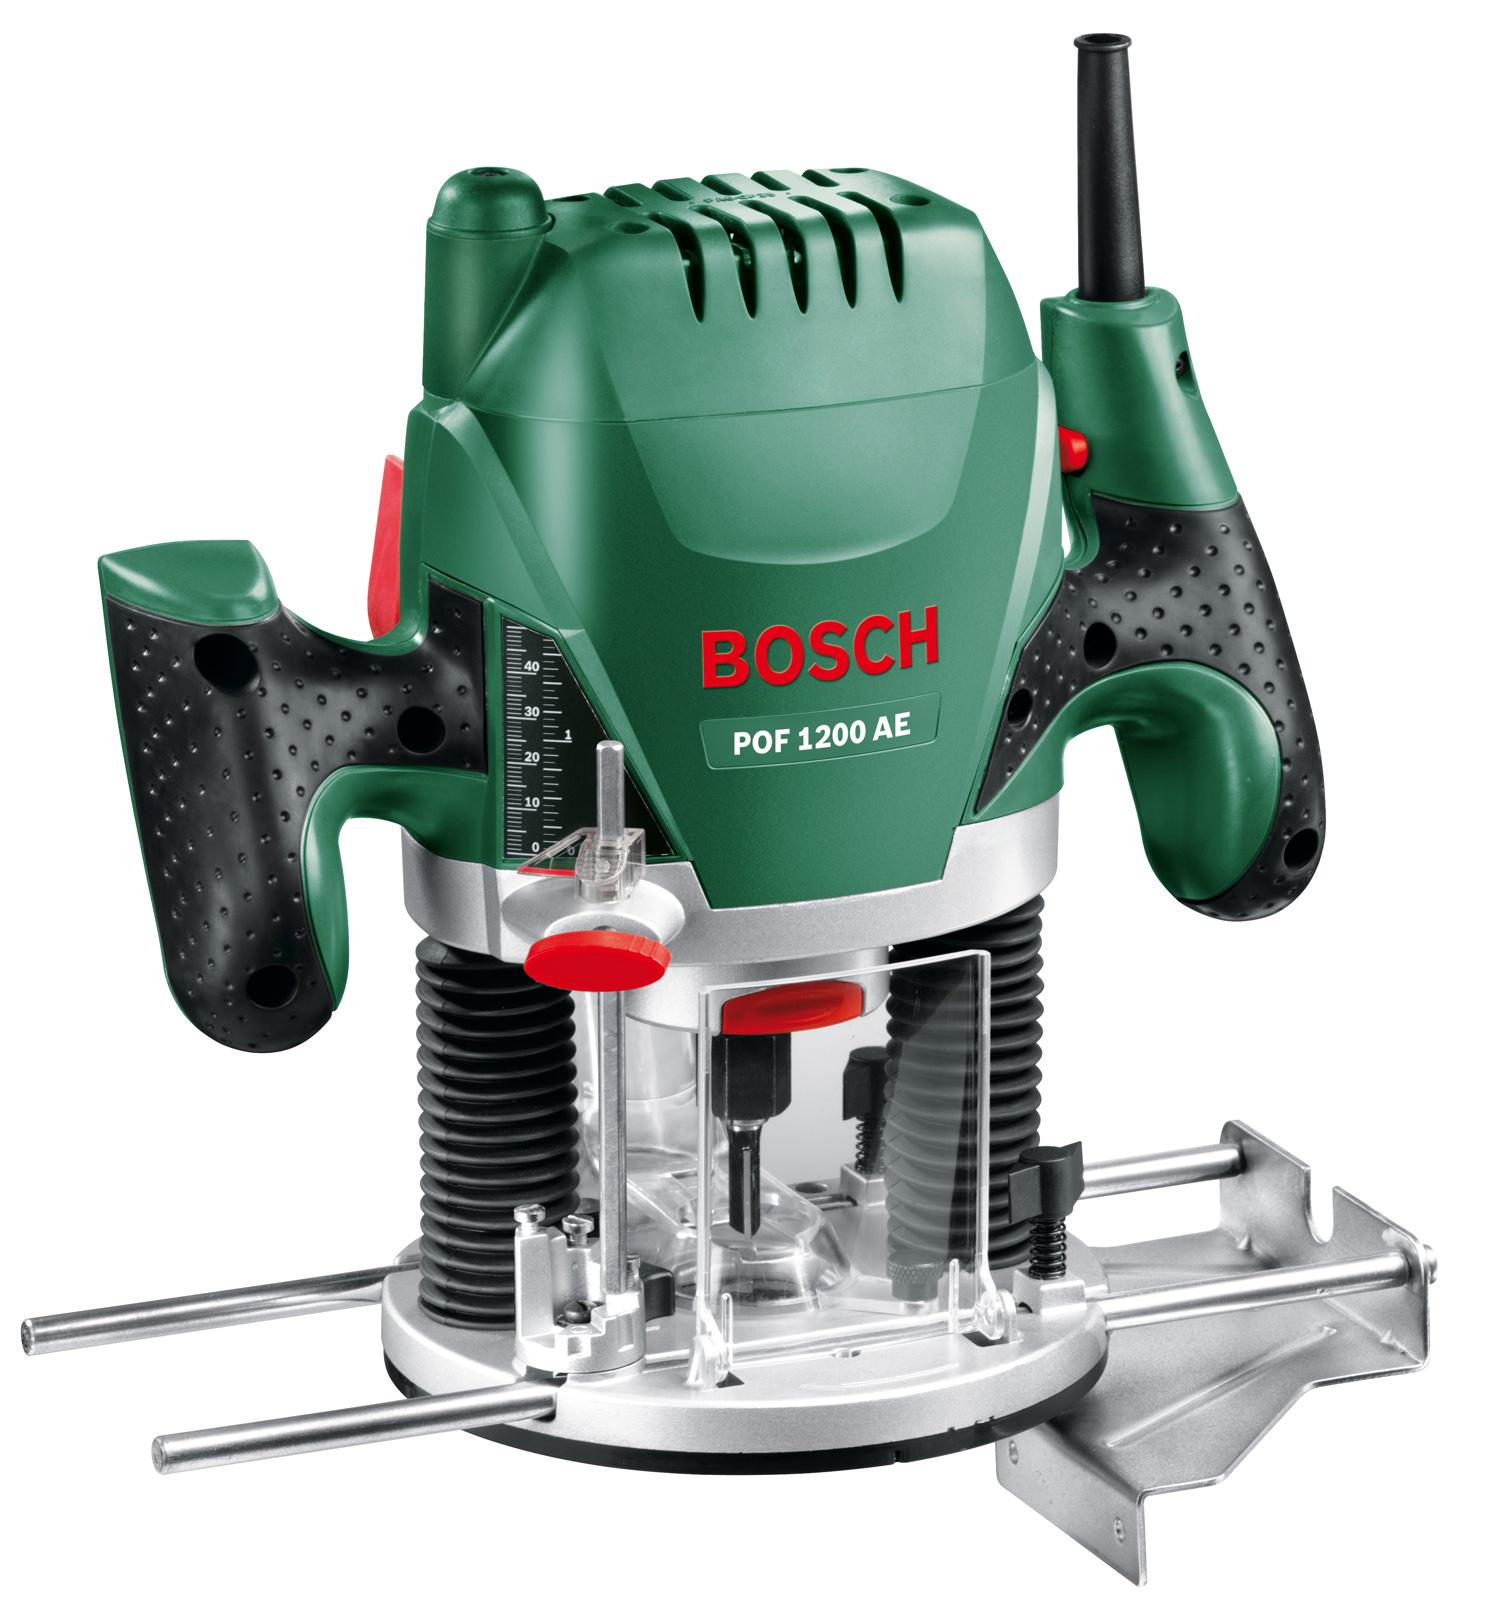 цены на Фрезер Bosch Pof 1200 ae (0.603.26a.100) в интернет-магазинах